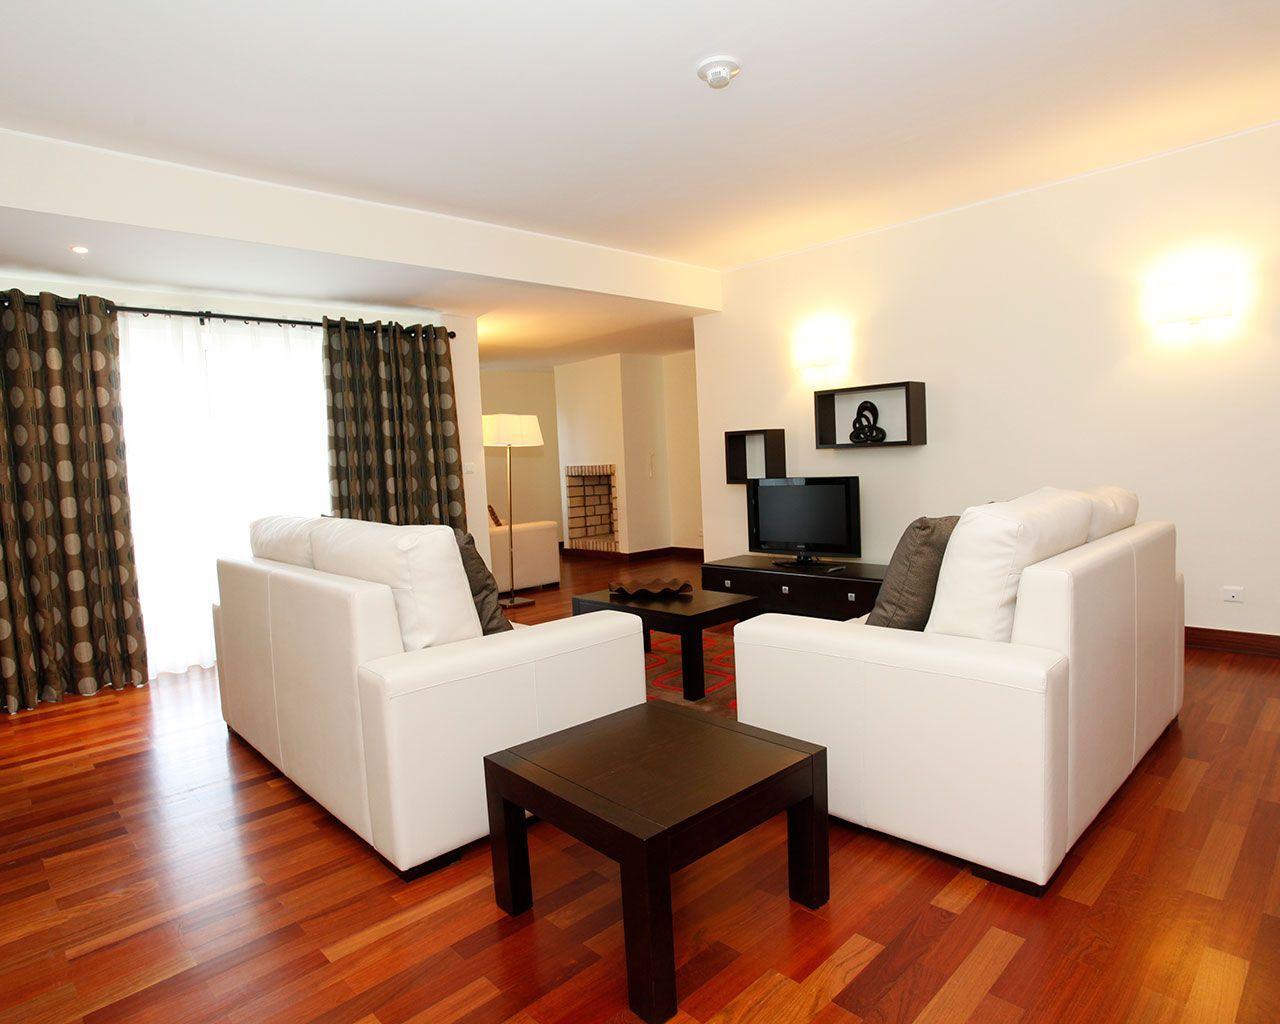 Sala de Estar - Apartamento T2 Standard